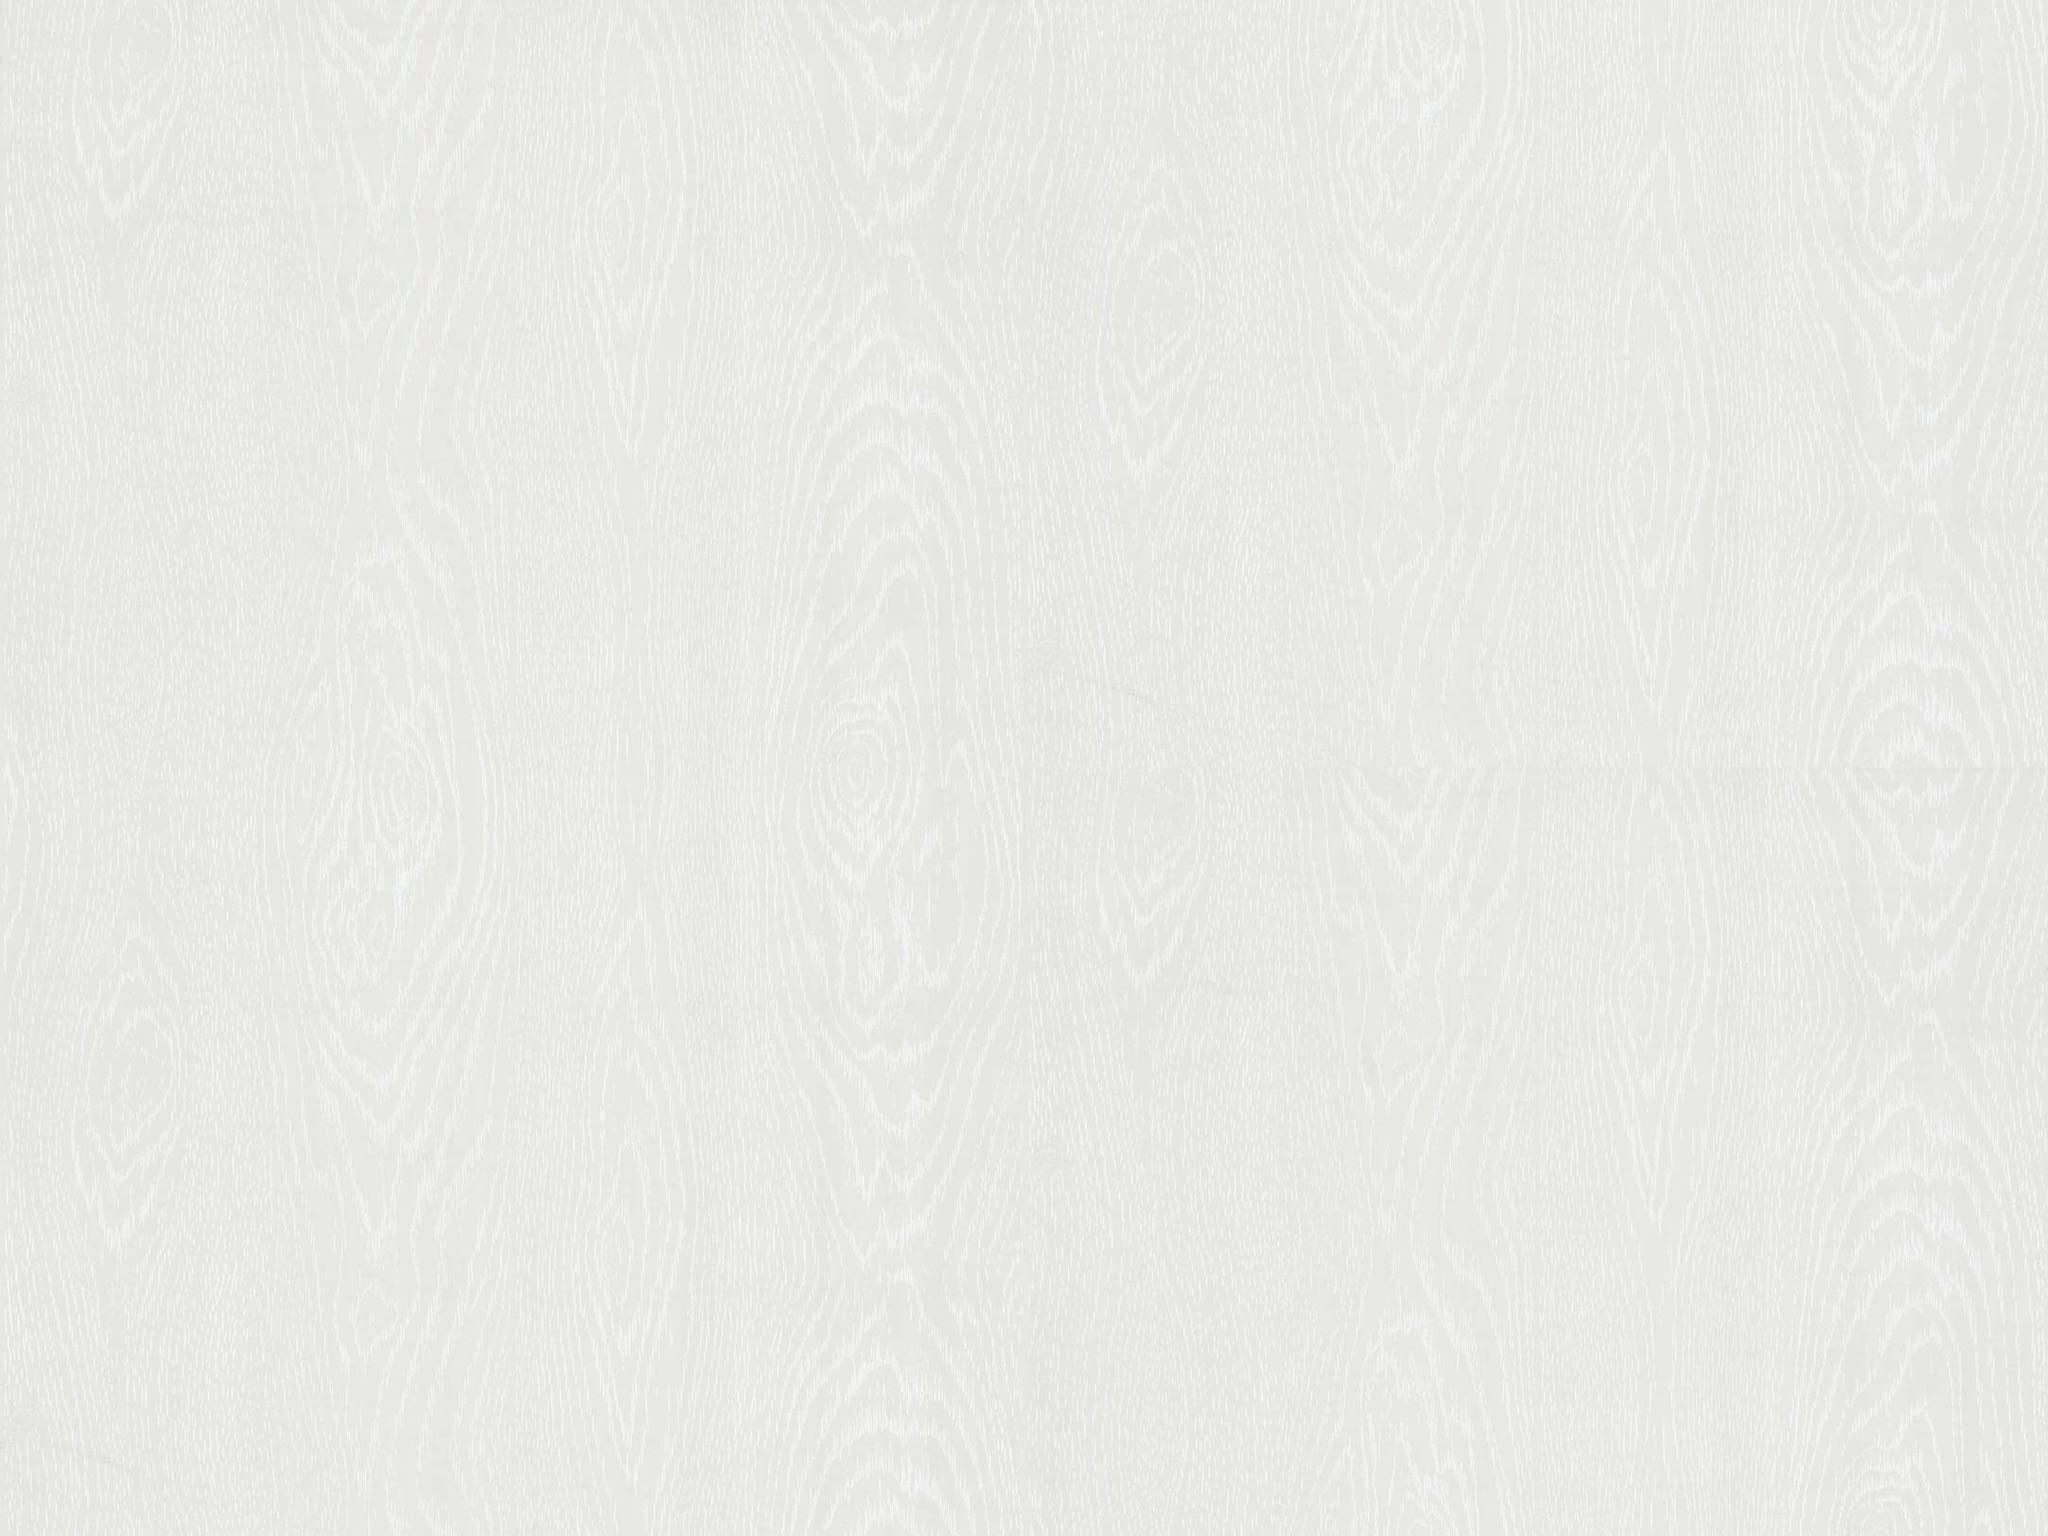 Обои Cole & Son Foundation 92/5026, интернет магазин Волео